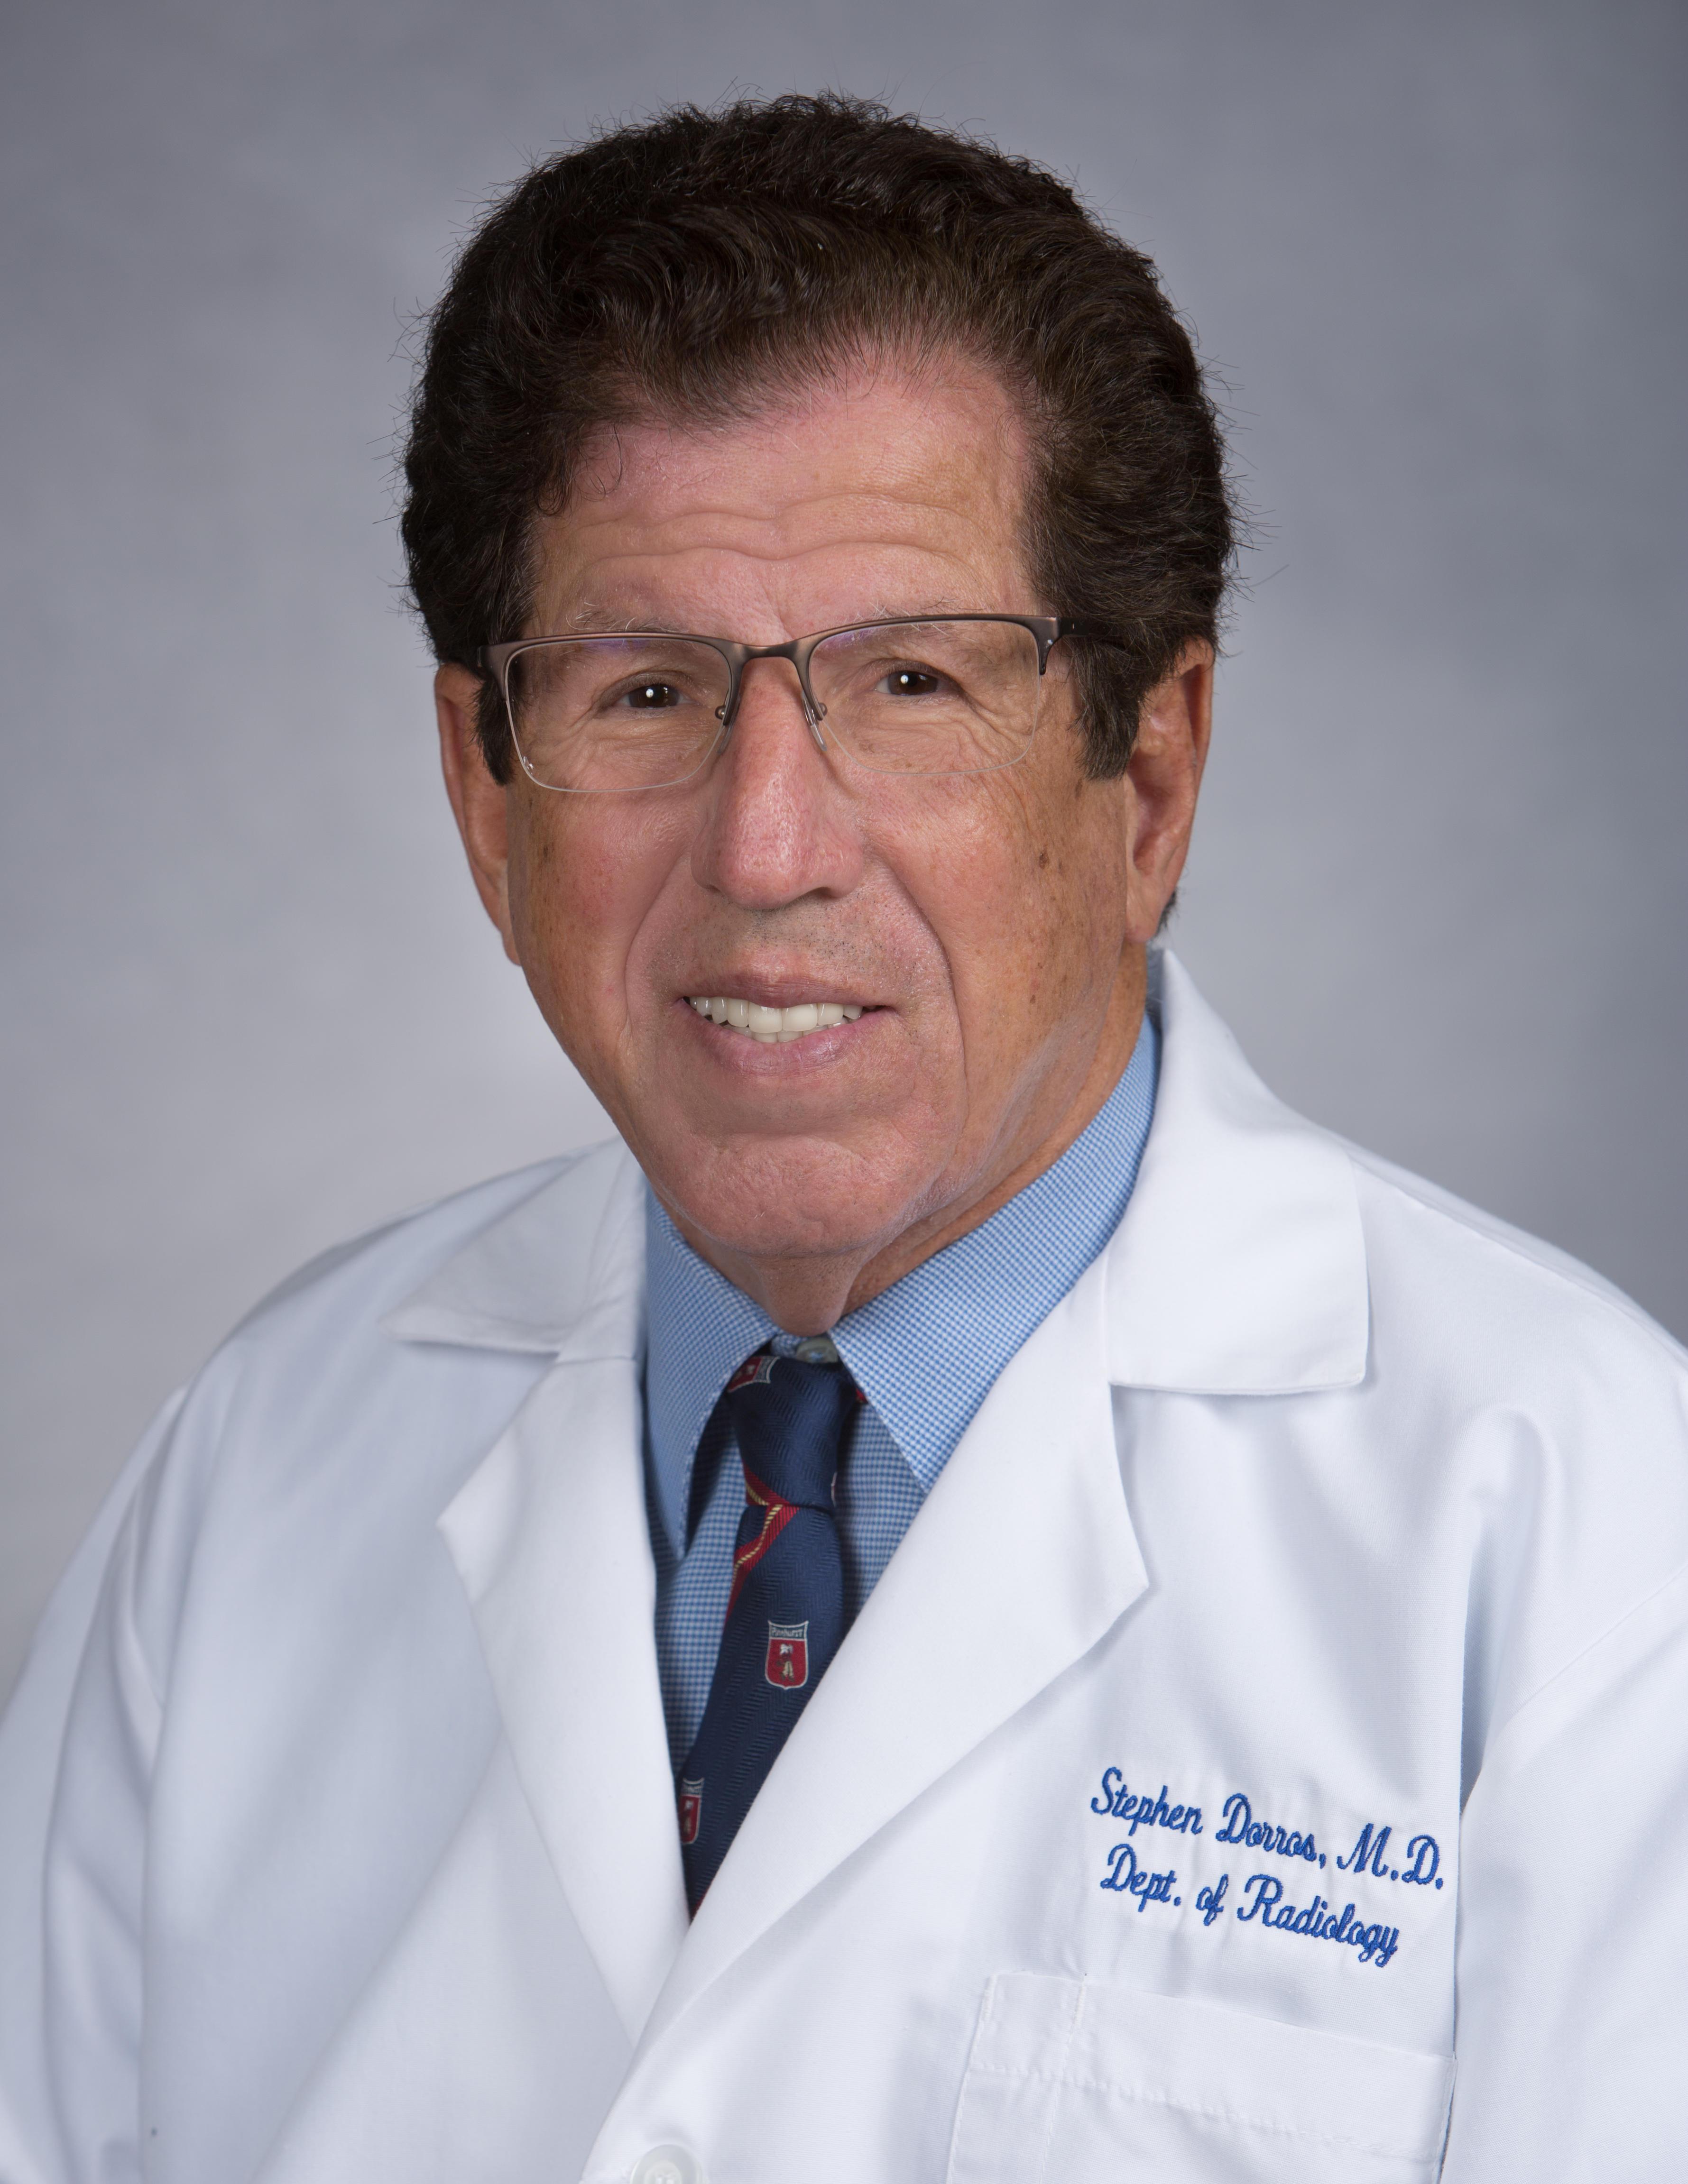 Stephen M. Dorros, MD